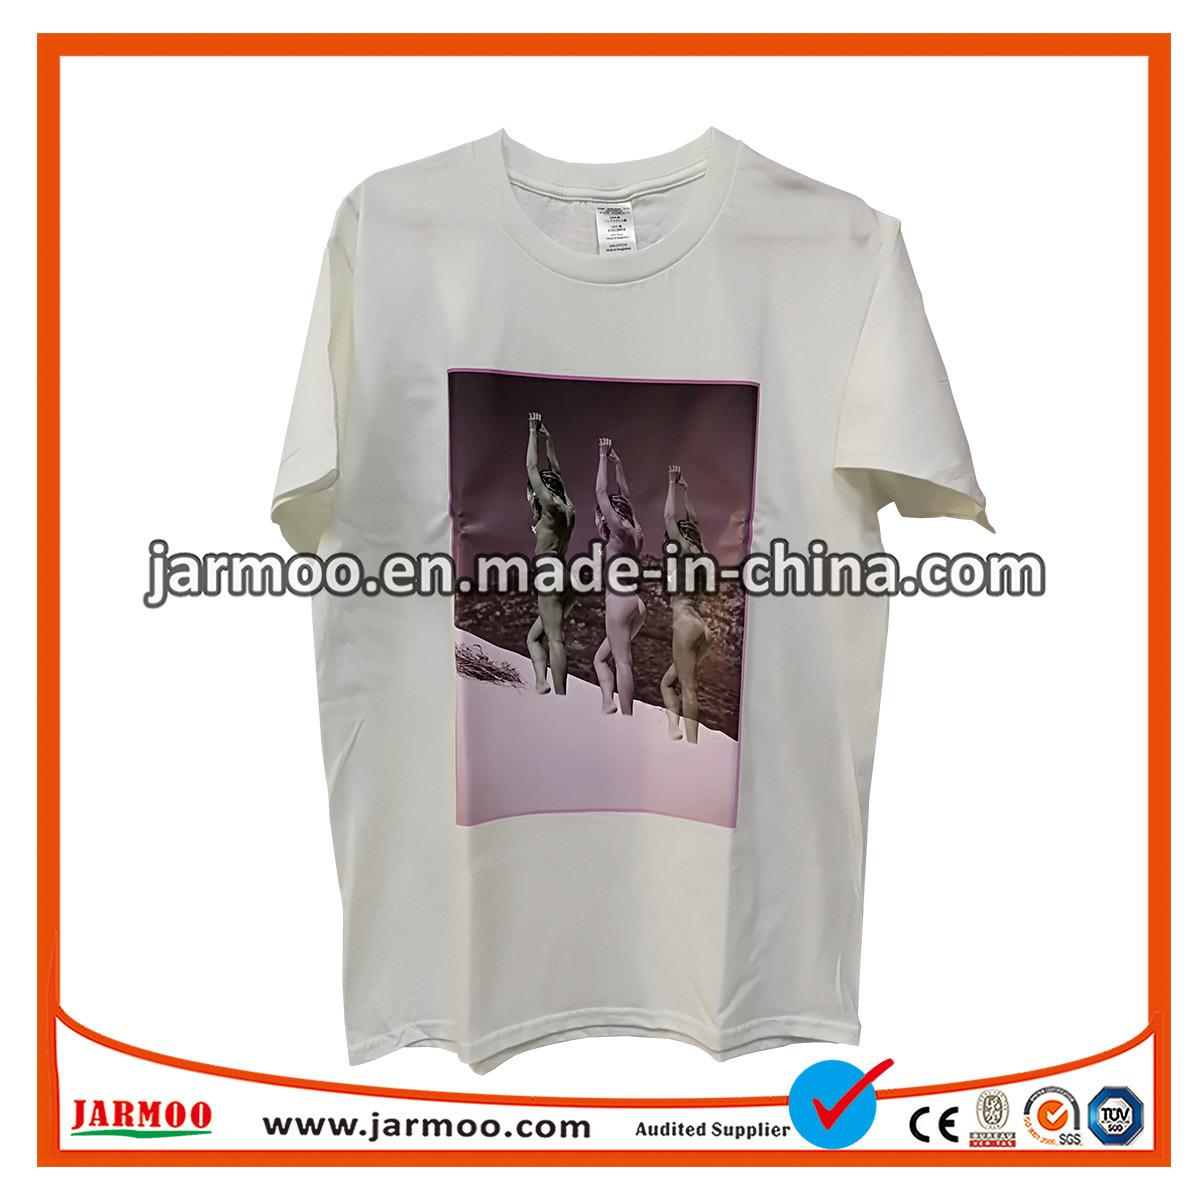 fb2fffdb4 China Wholesale Custom Printing 100% Cotton Promotional T Shirt ...